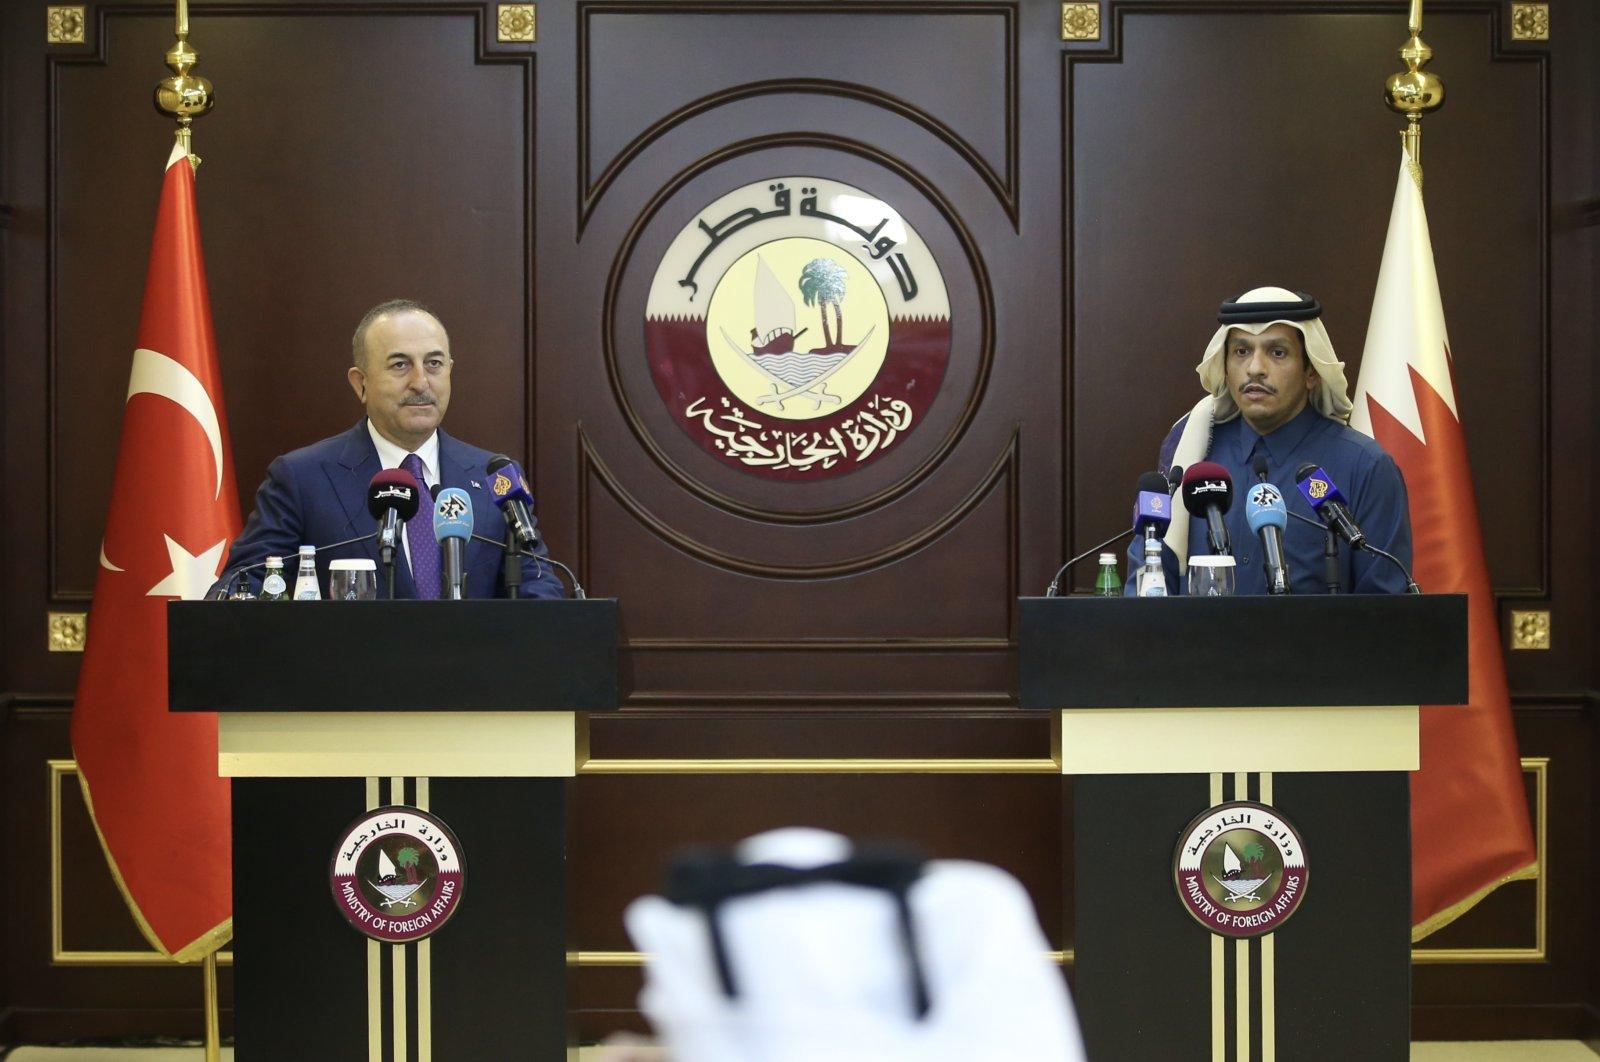 Foreign Minister Mevlüt Çavuşoğlu at a news conference with his Qatari counterpartSheikh Mohammed bin Abdulrahman Al Thani in Doha, Qatar, Feb. 11, 2021. (AA Photo)